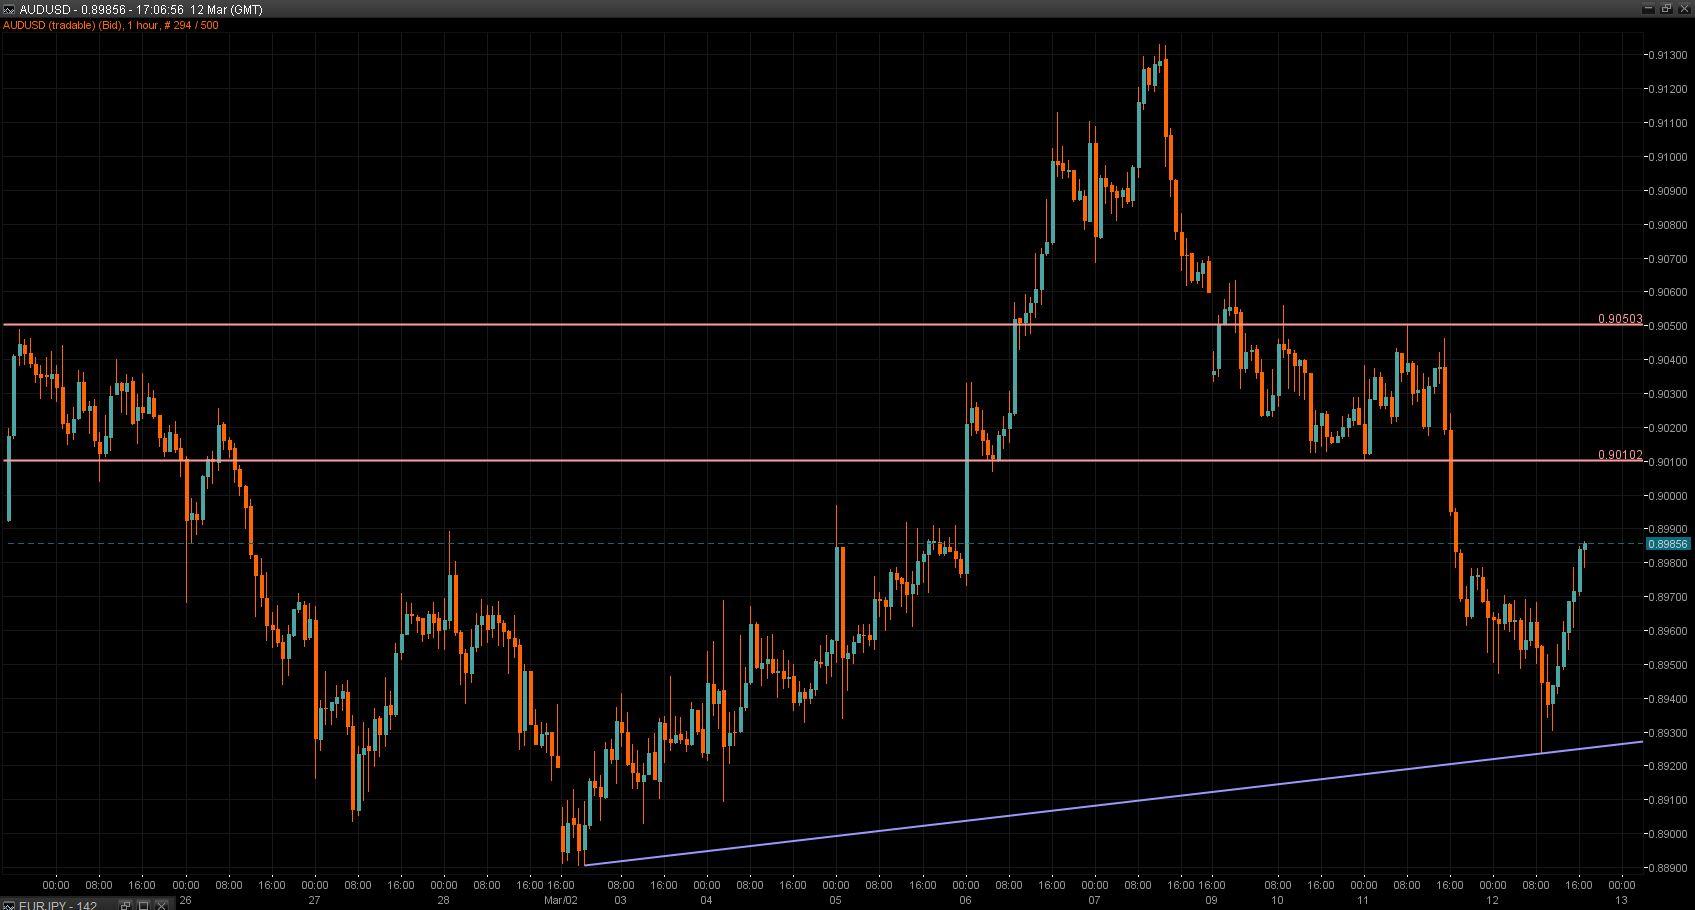 AUD/USD Chart 12 Mar 2014